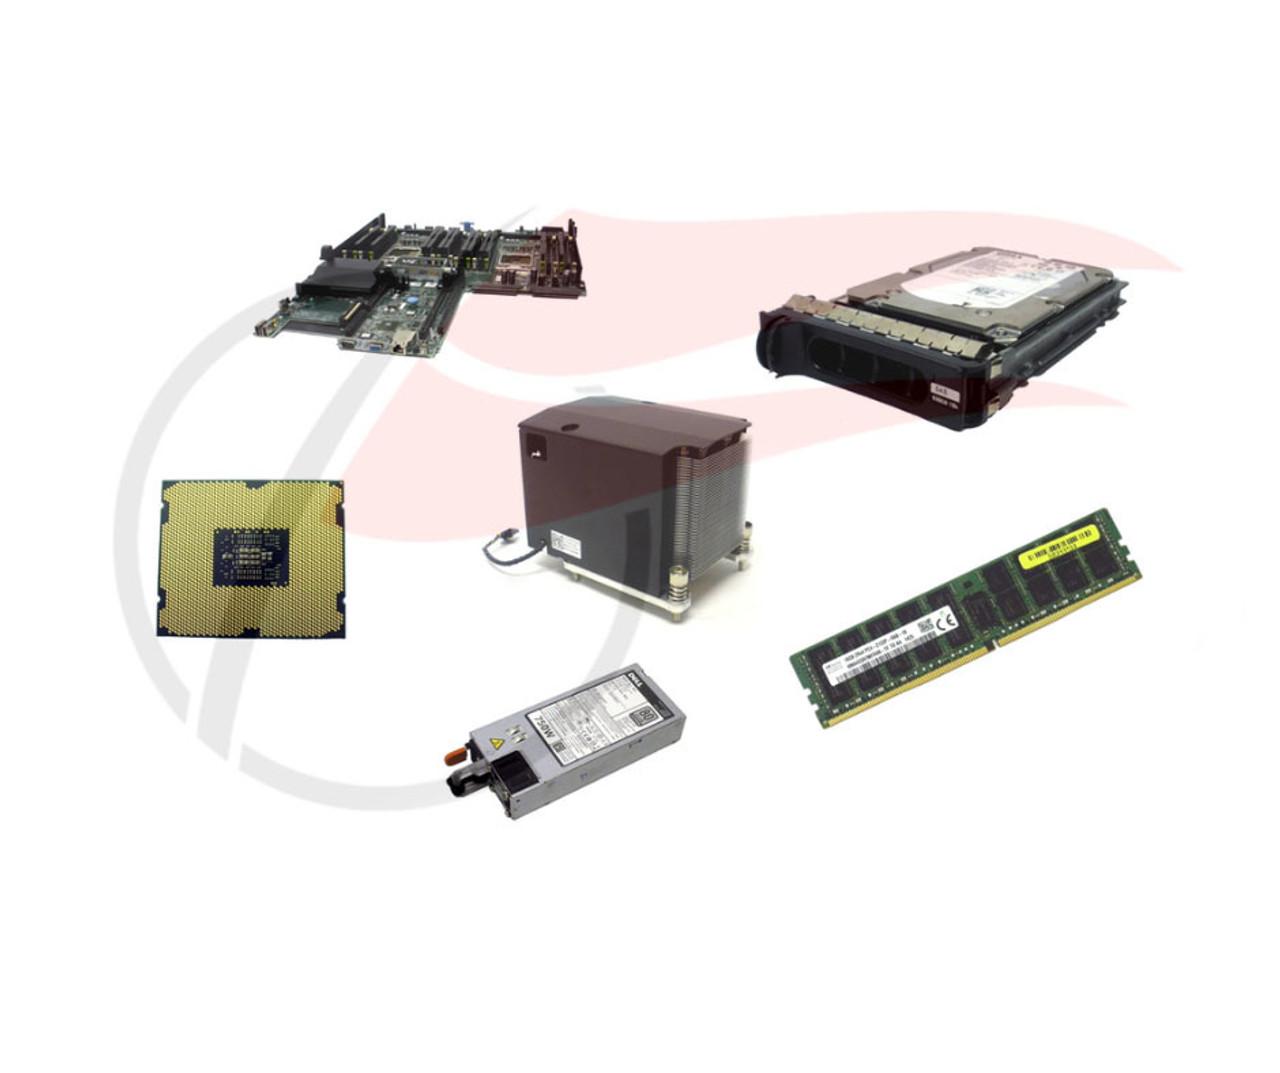 Dell PowerEdge R730 Bezels